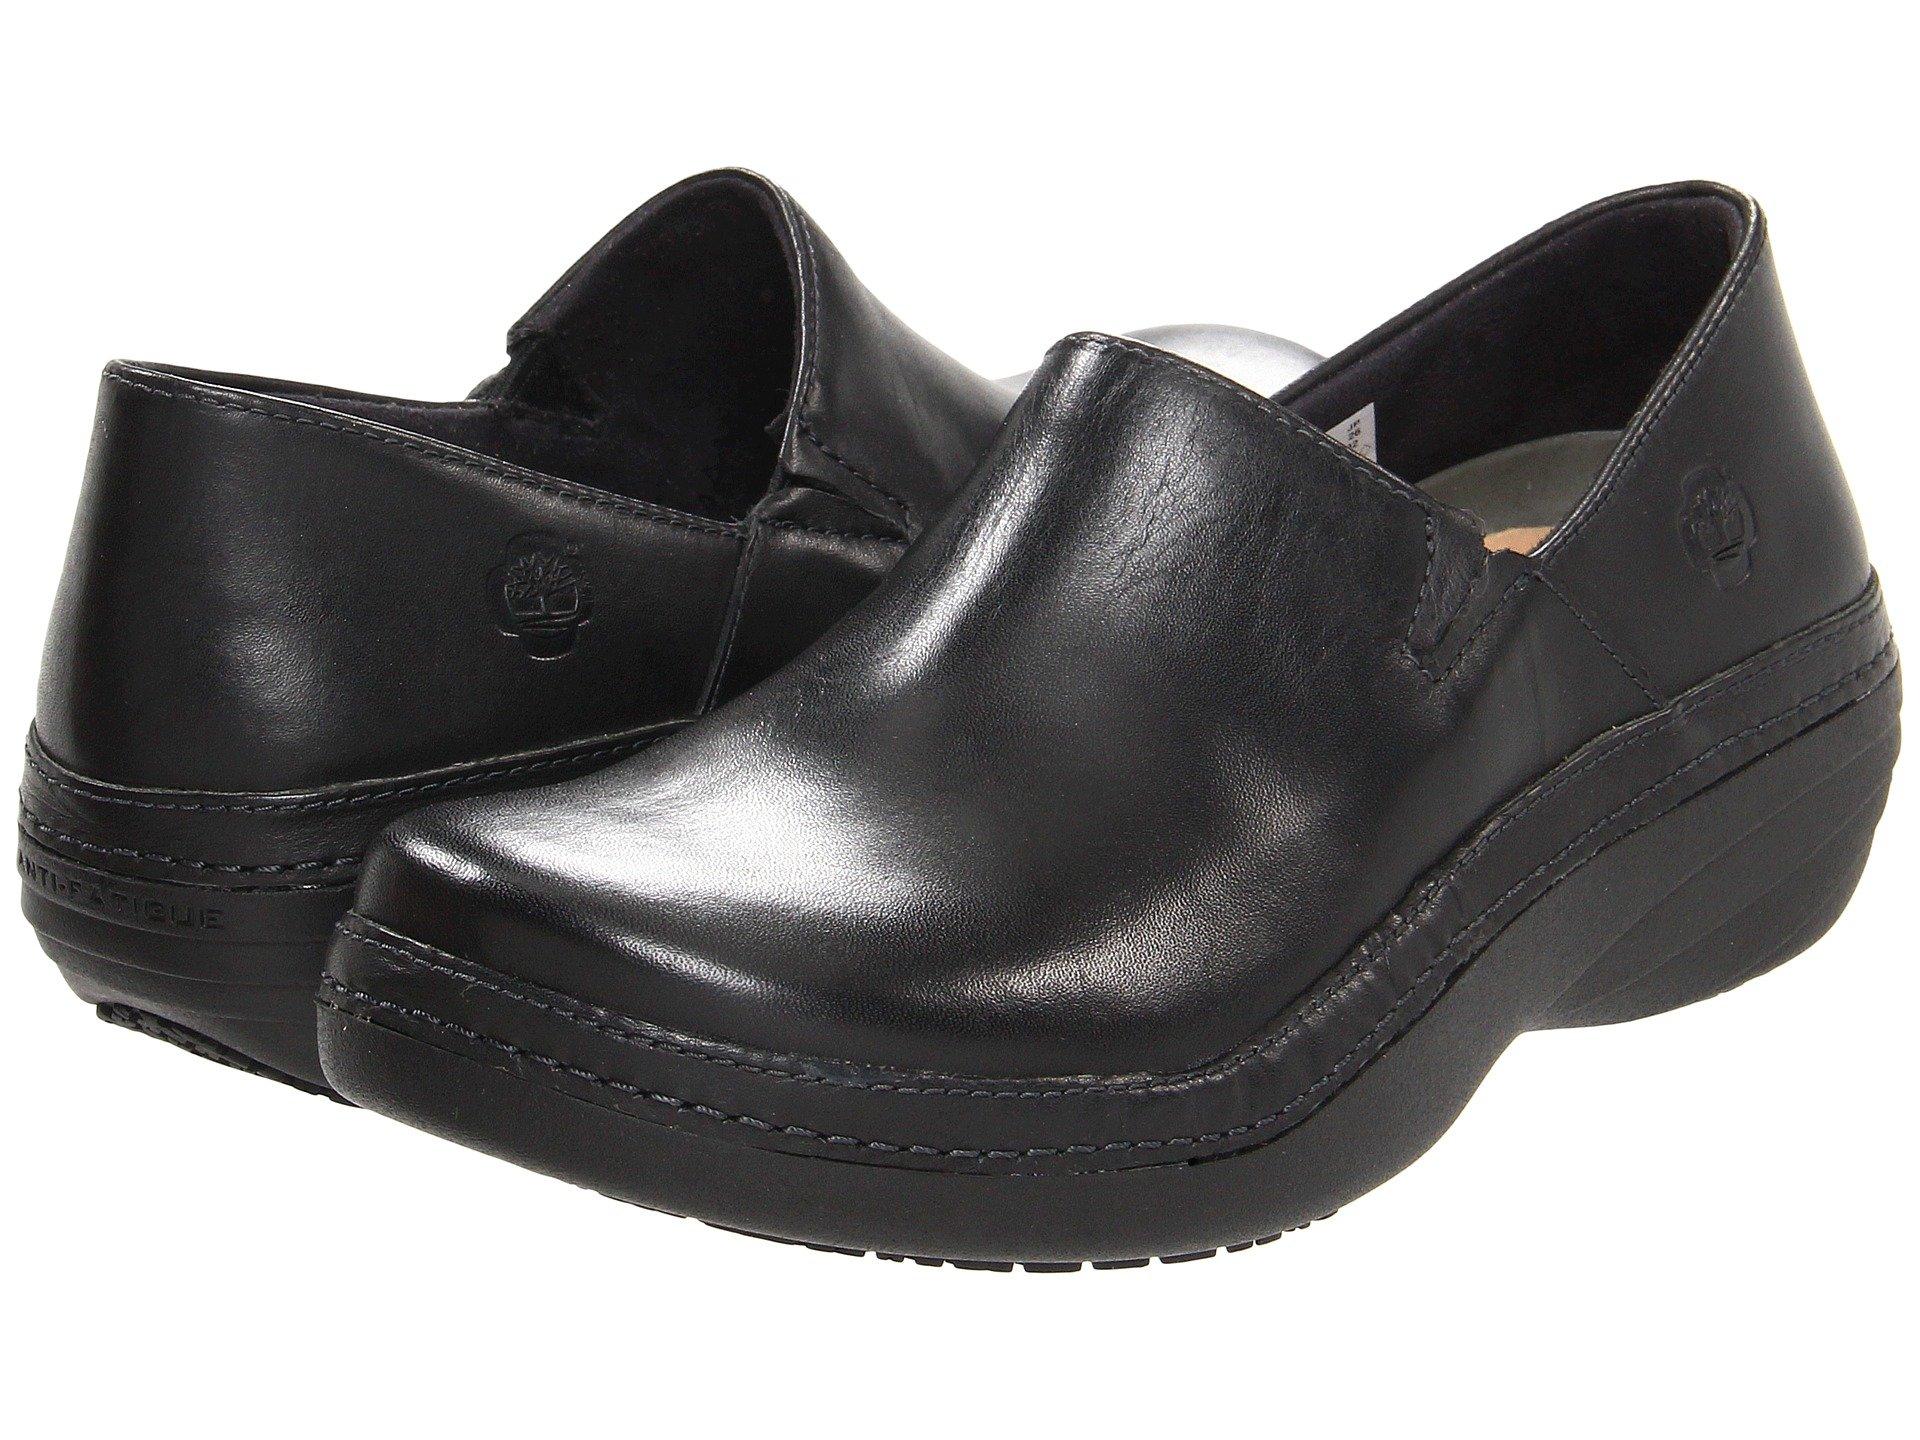 b364ed79e0a416 Women s Timberland PRO Shoes + FREE SHIPPING